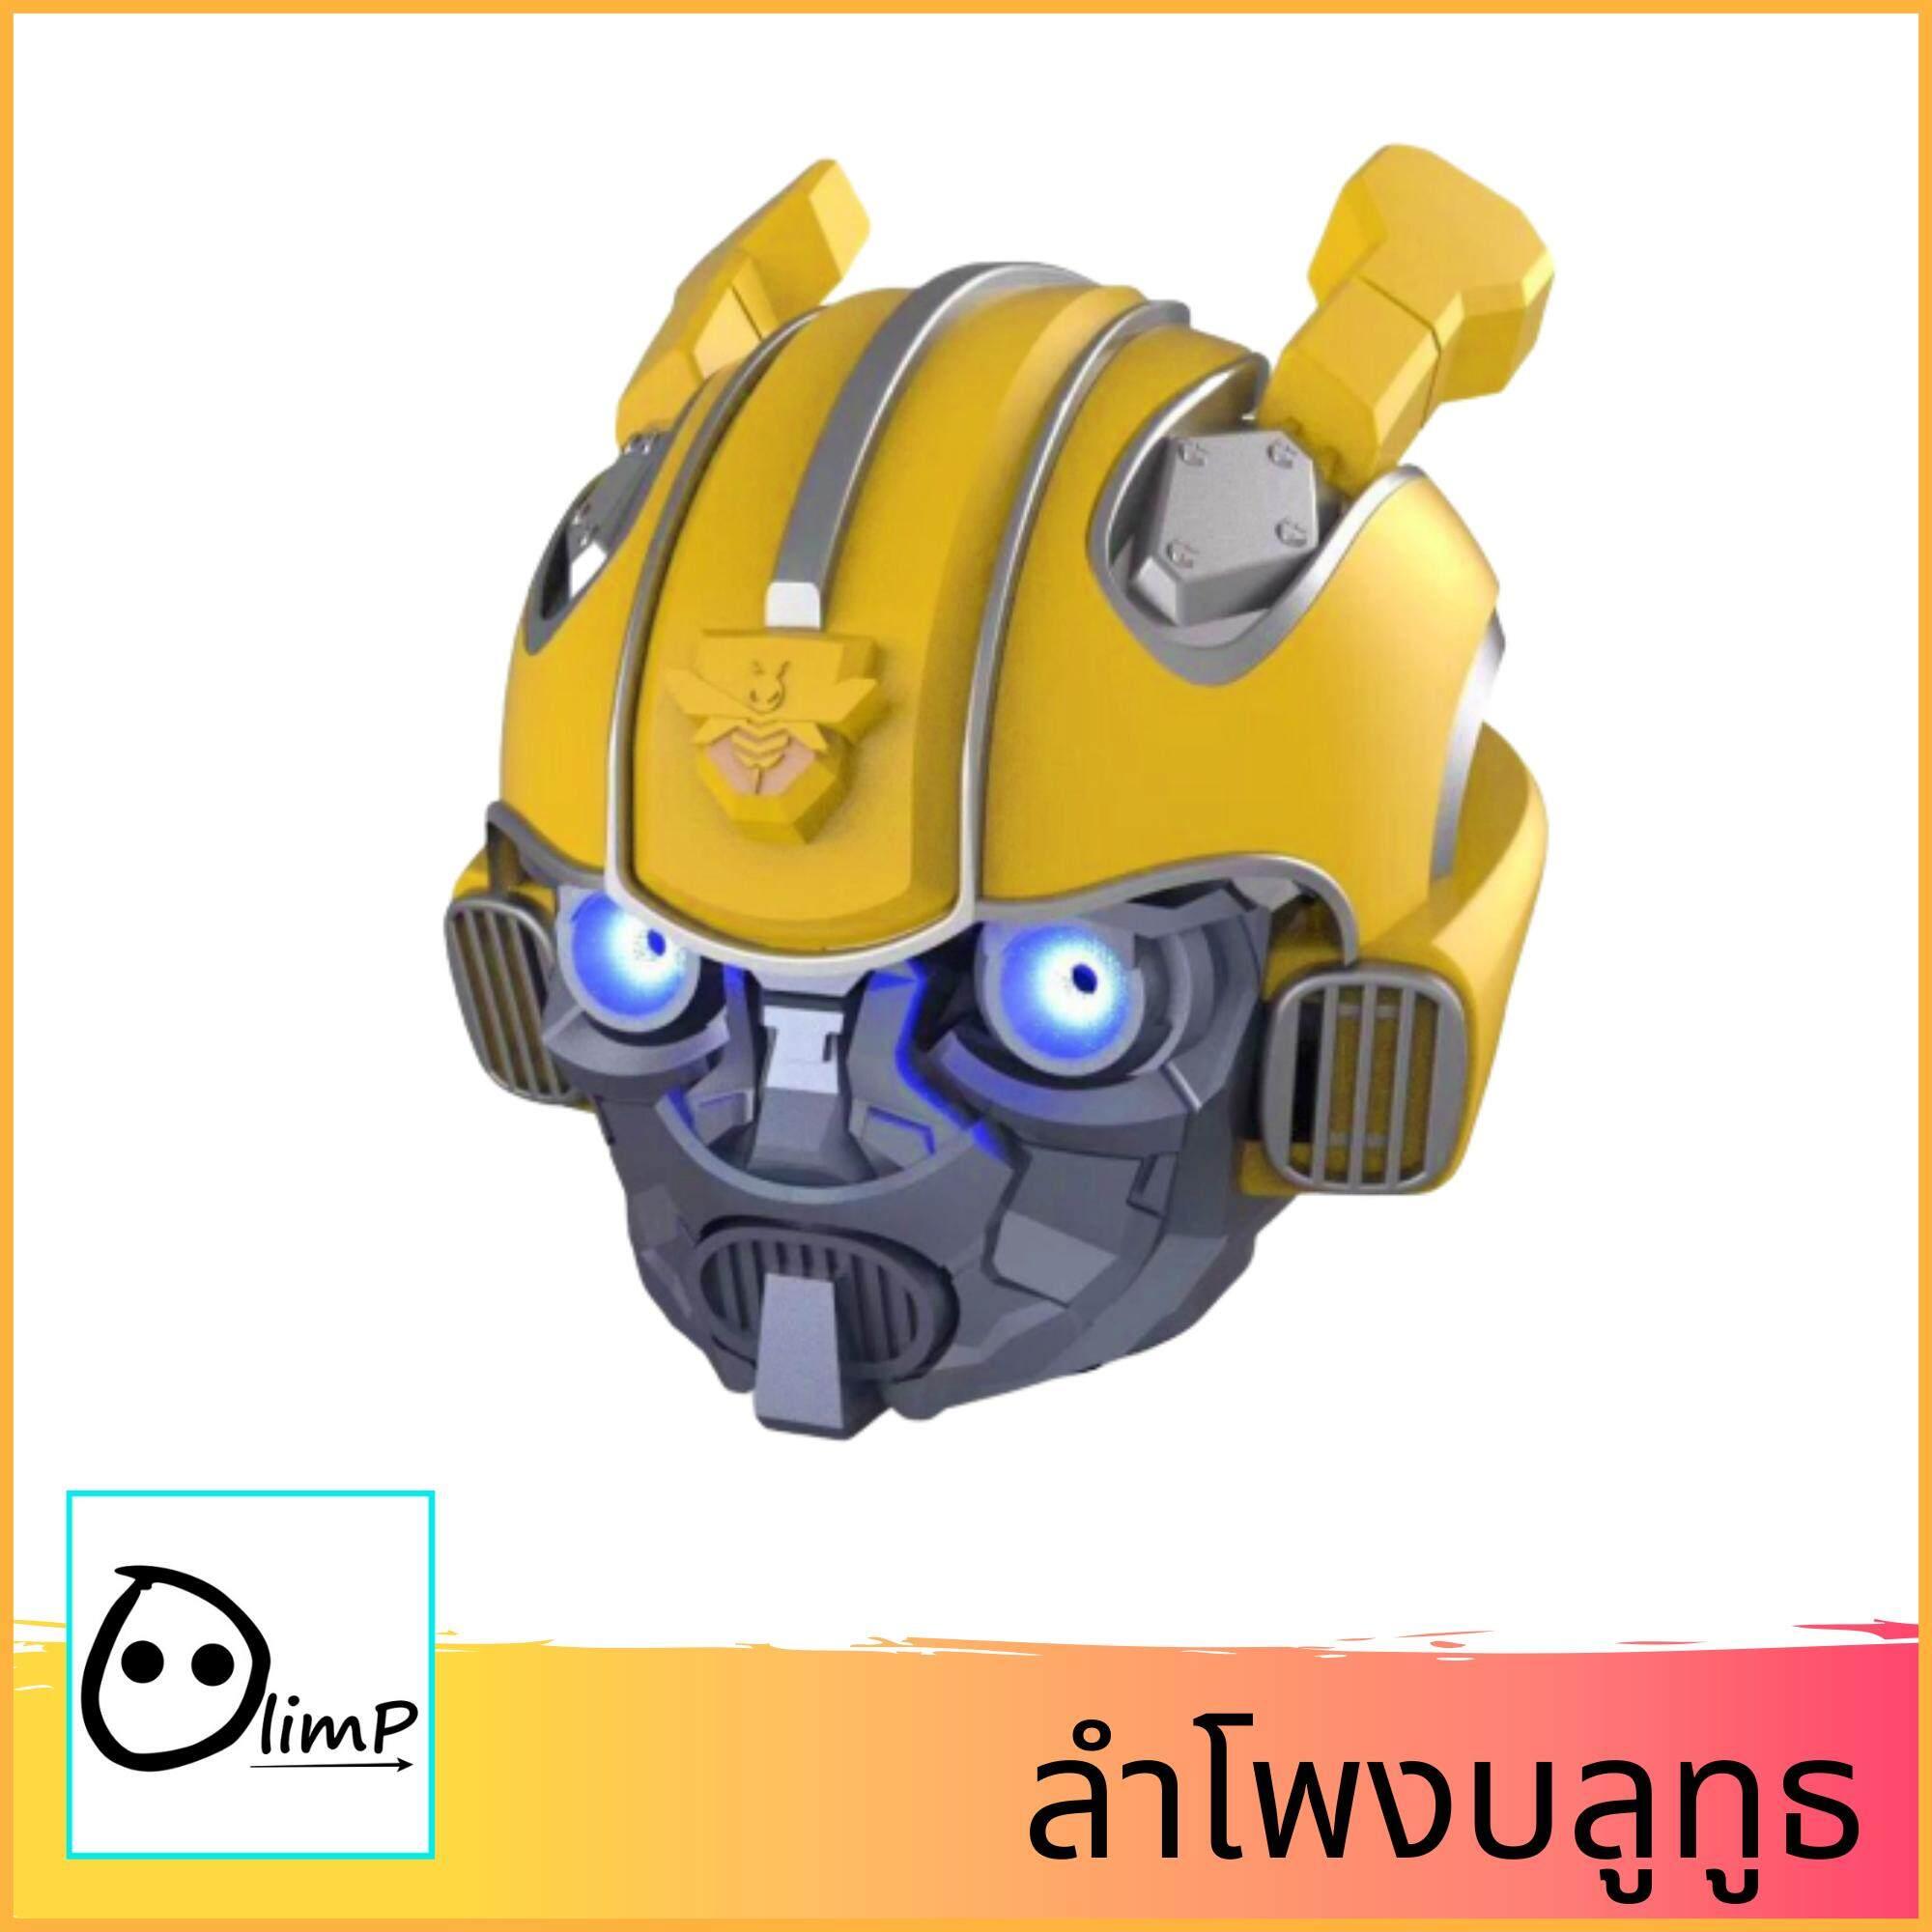 Bumblebee ลำโพงบูลทูธไร้สาย เบสหนัก เสียงดี เชื่อมต่อ Bt / Flash Drive / Tf รุ่น G3ลำโพง ลำโพงบลูทูธ ลำโพงคอม ซาวด์บาร์ ตู้ลำโพง ลำโพงbluetooth ลำโพงjbl ซับวูฟเฟอร์ ตู้ซับเบส เครื่องเสียง ลำโพงพกพา ลำโพงเคลื่อนที่ มินิลำโพง ลําโพงlazada ลําโพงเบสหนัก.